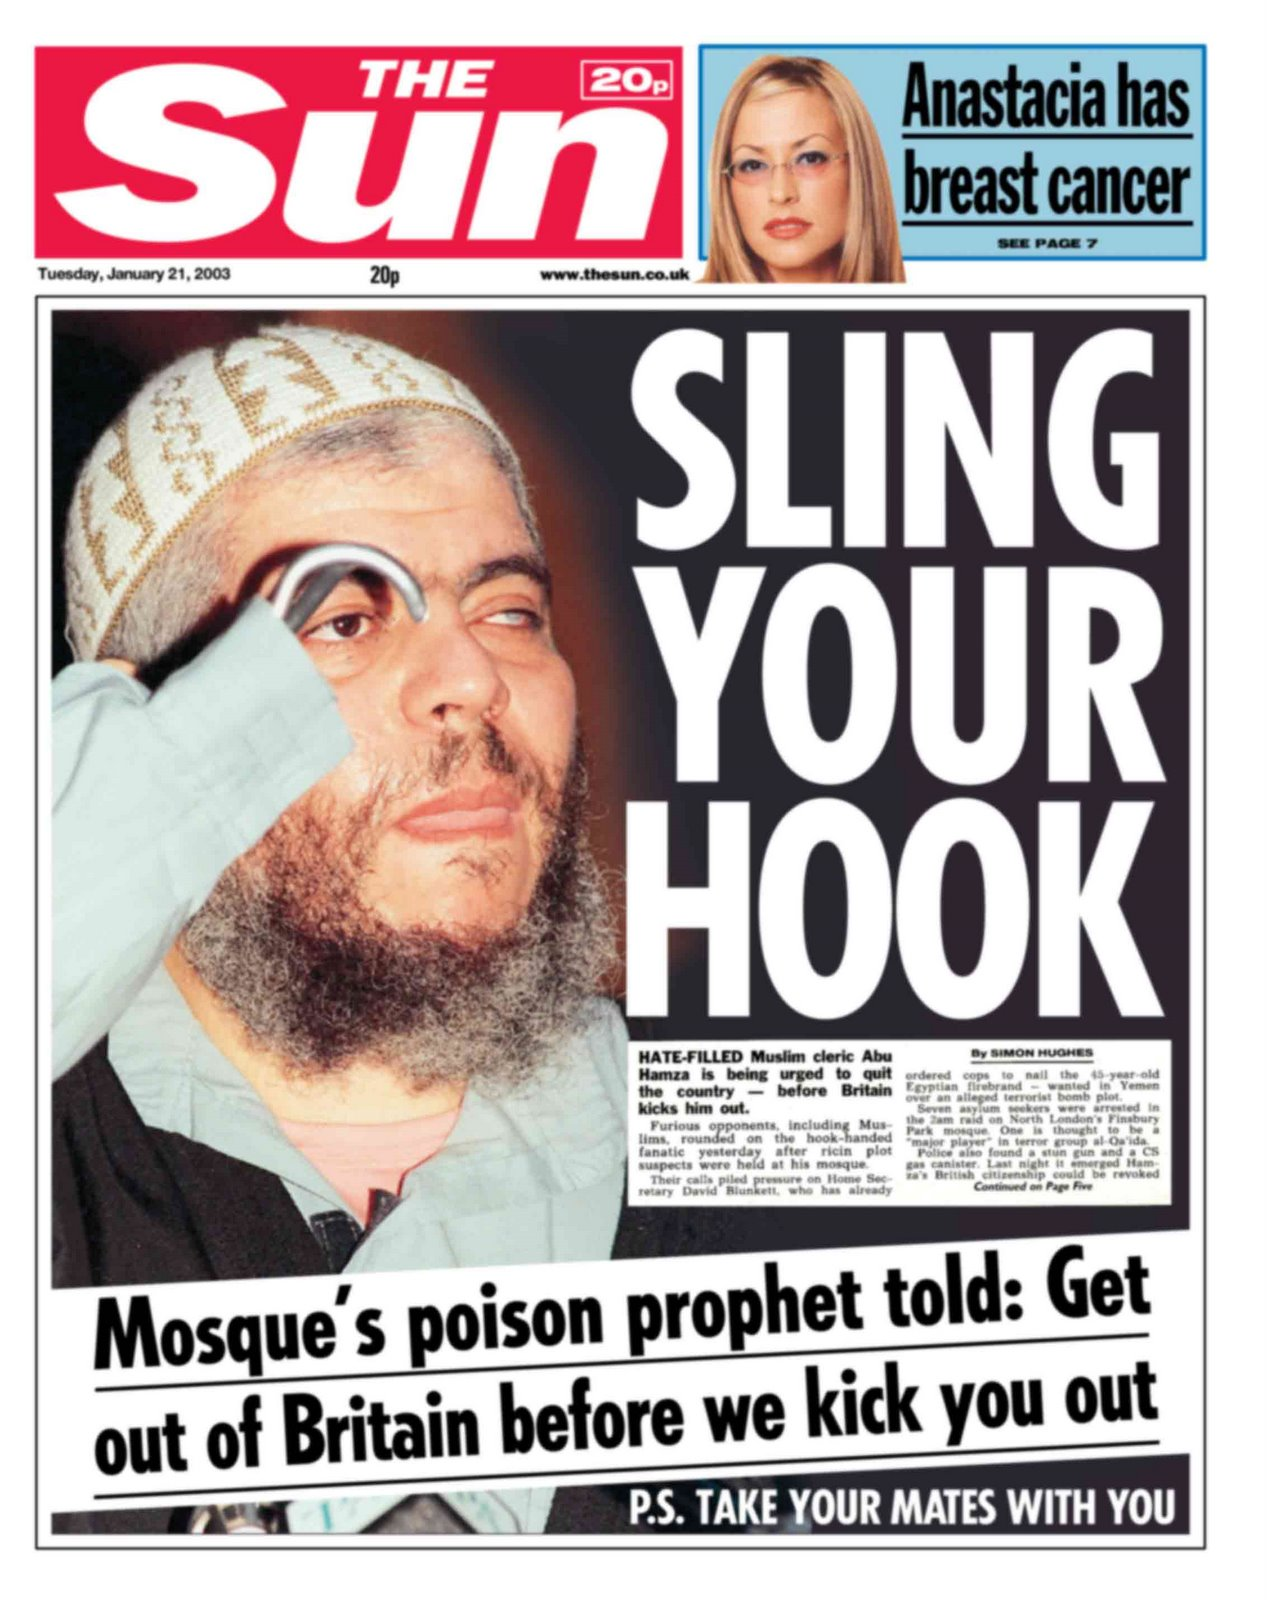 The Sun Splash Headline Abu Hamza al-Masri, Sling your hook. What copywriters can learn from tabloid writers